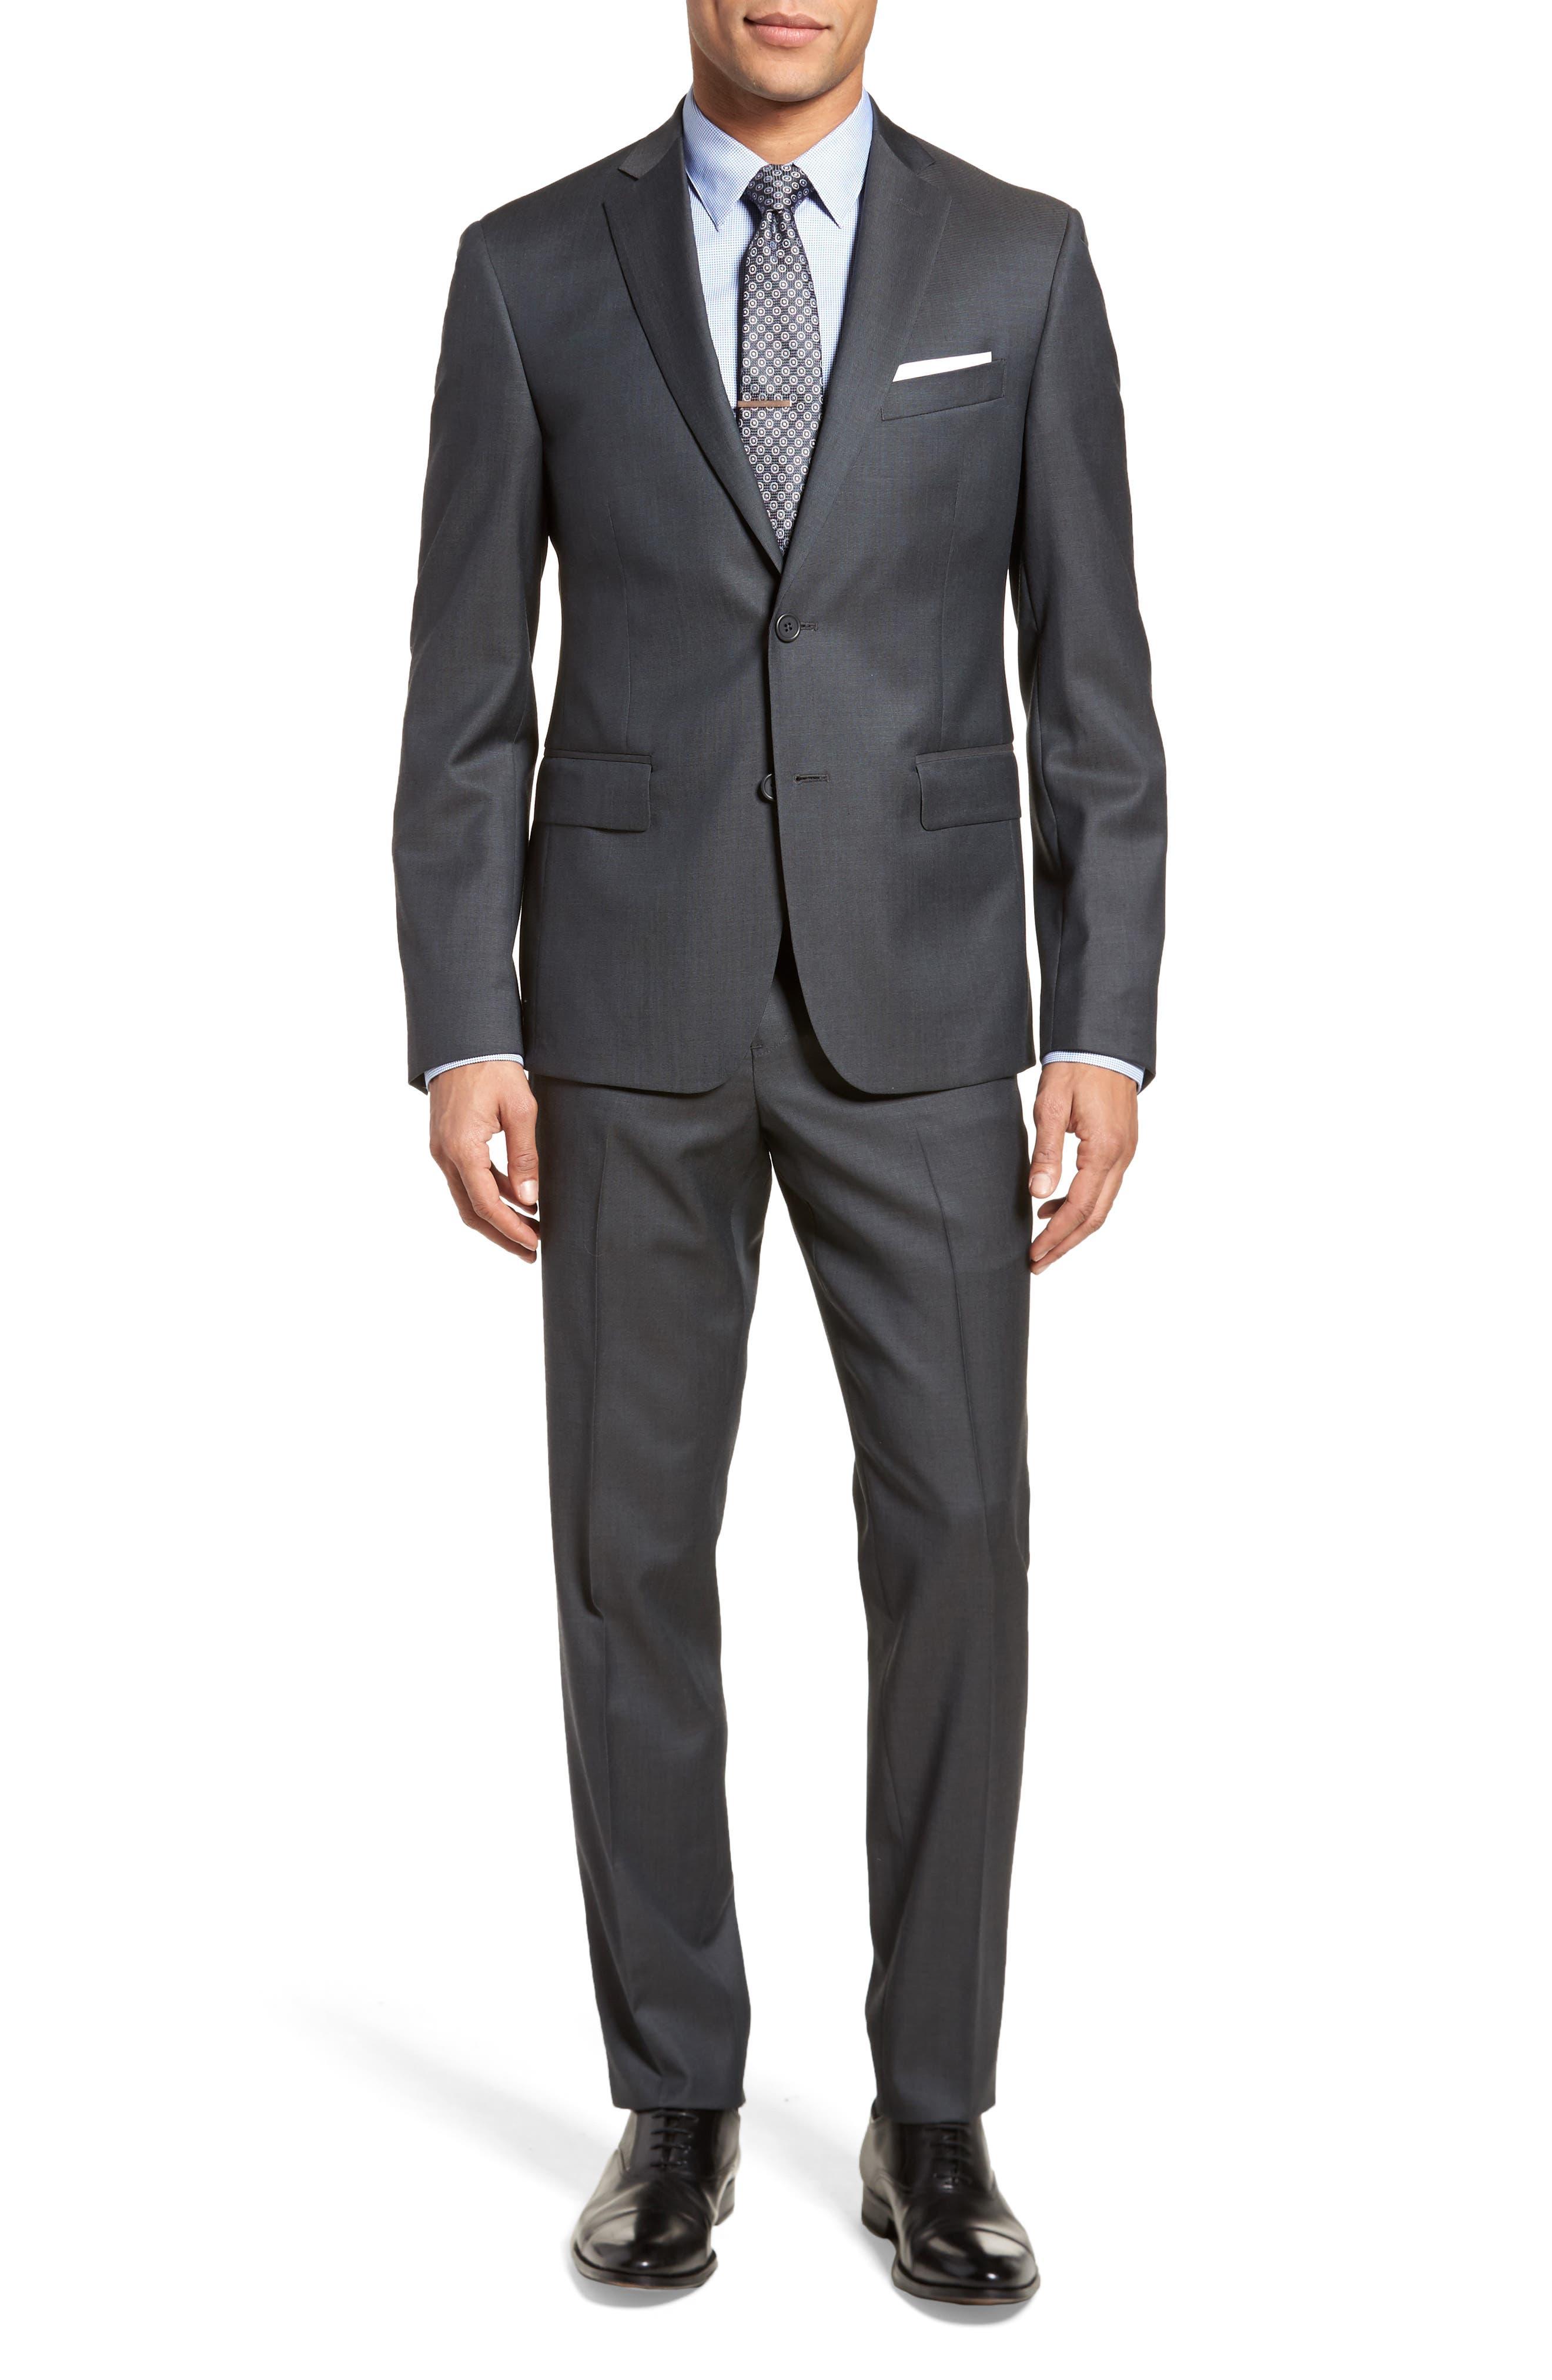 Main Image - Nordstrom Men's Shop Extra Trim Fit Solid Wool Suit